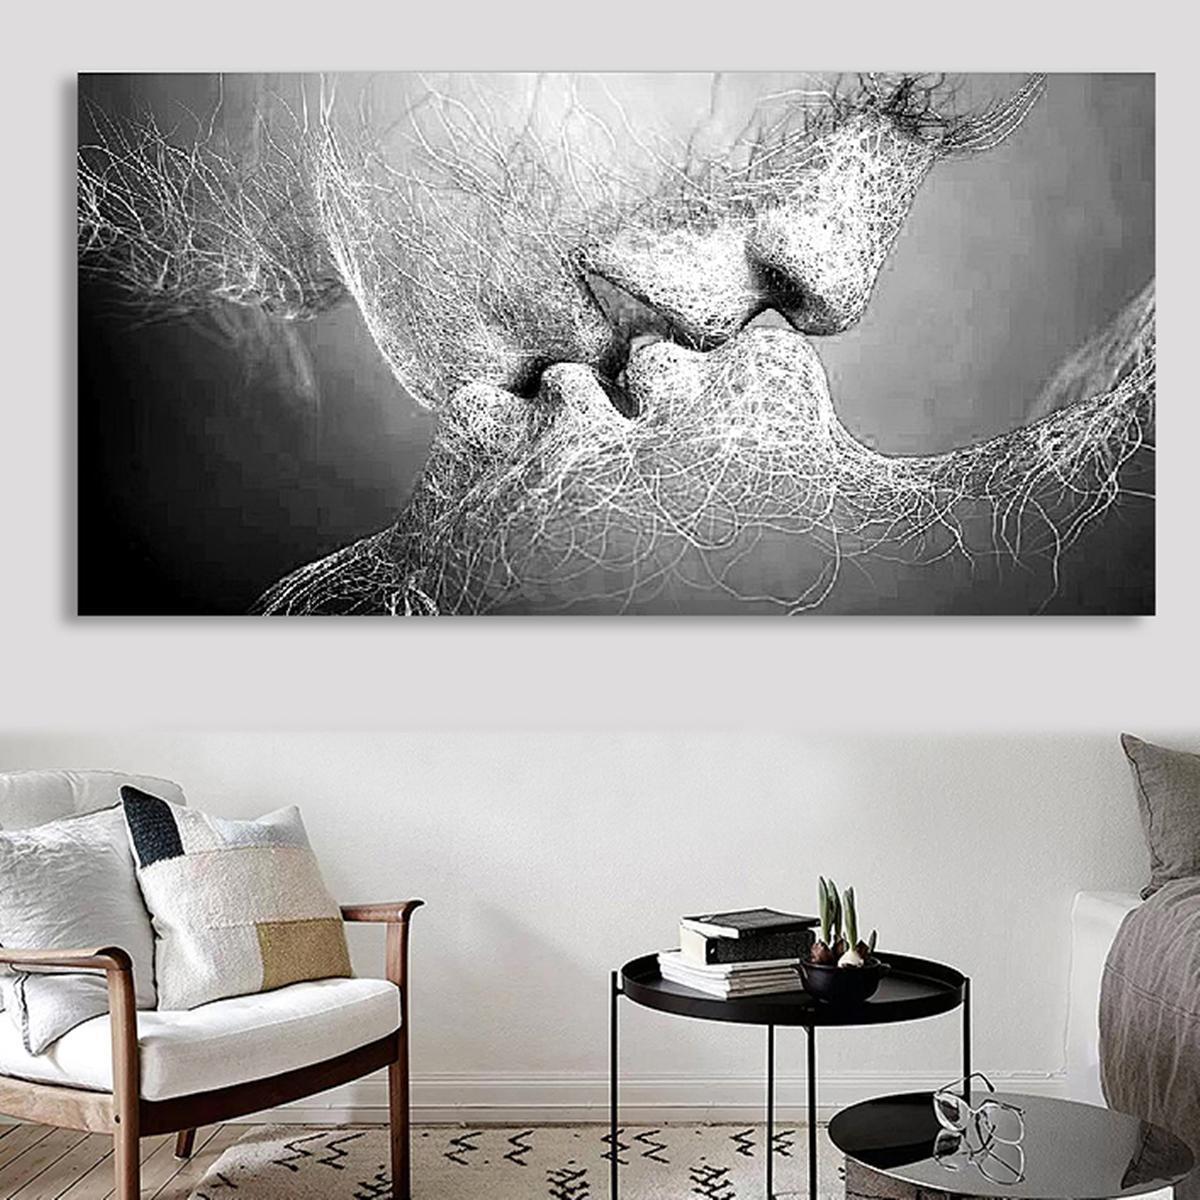 Black & White Love Kiss Abstract Art On Canvas Painting Wall Art Regarding Black Love Wall Art (Image 1 of 20)